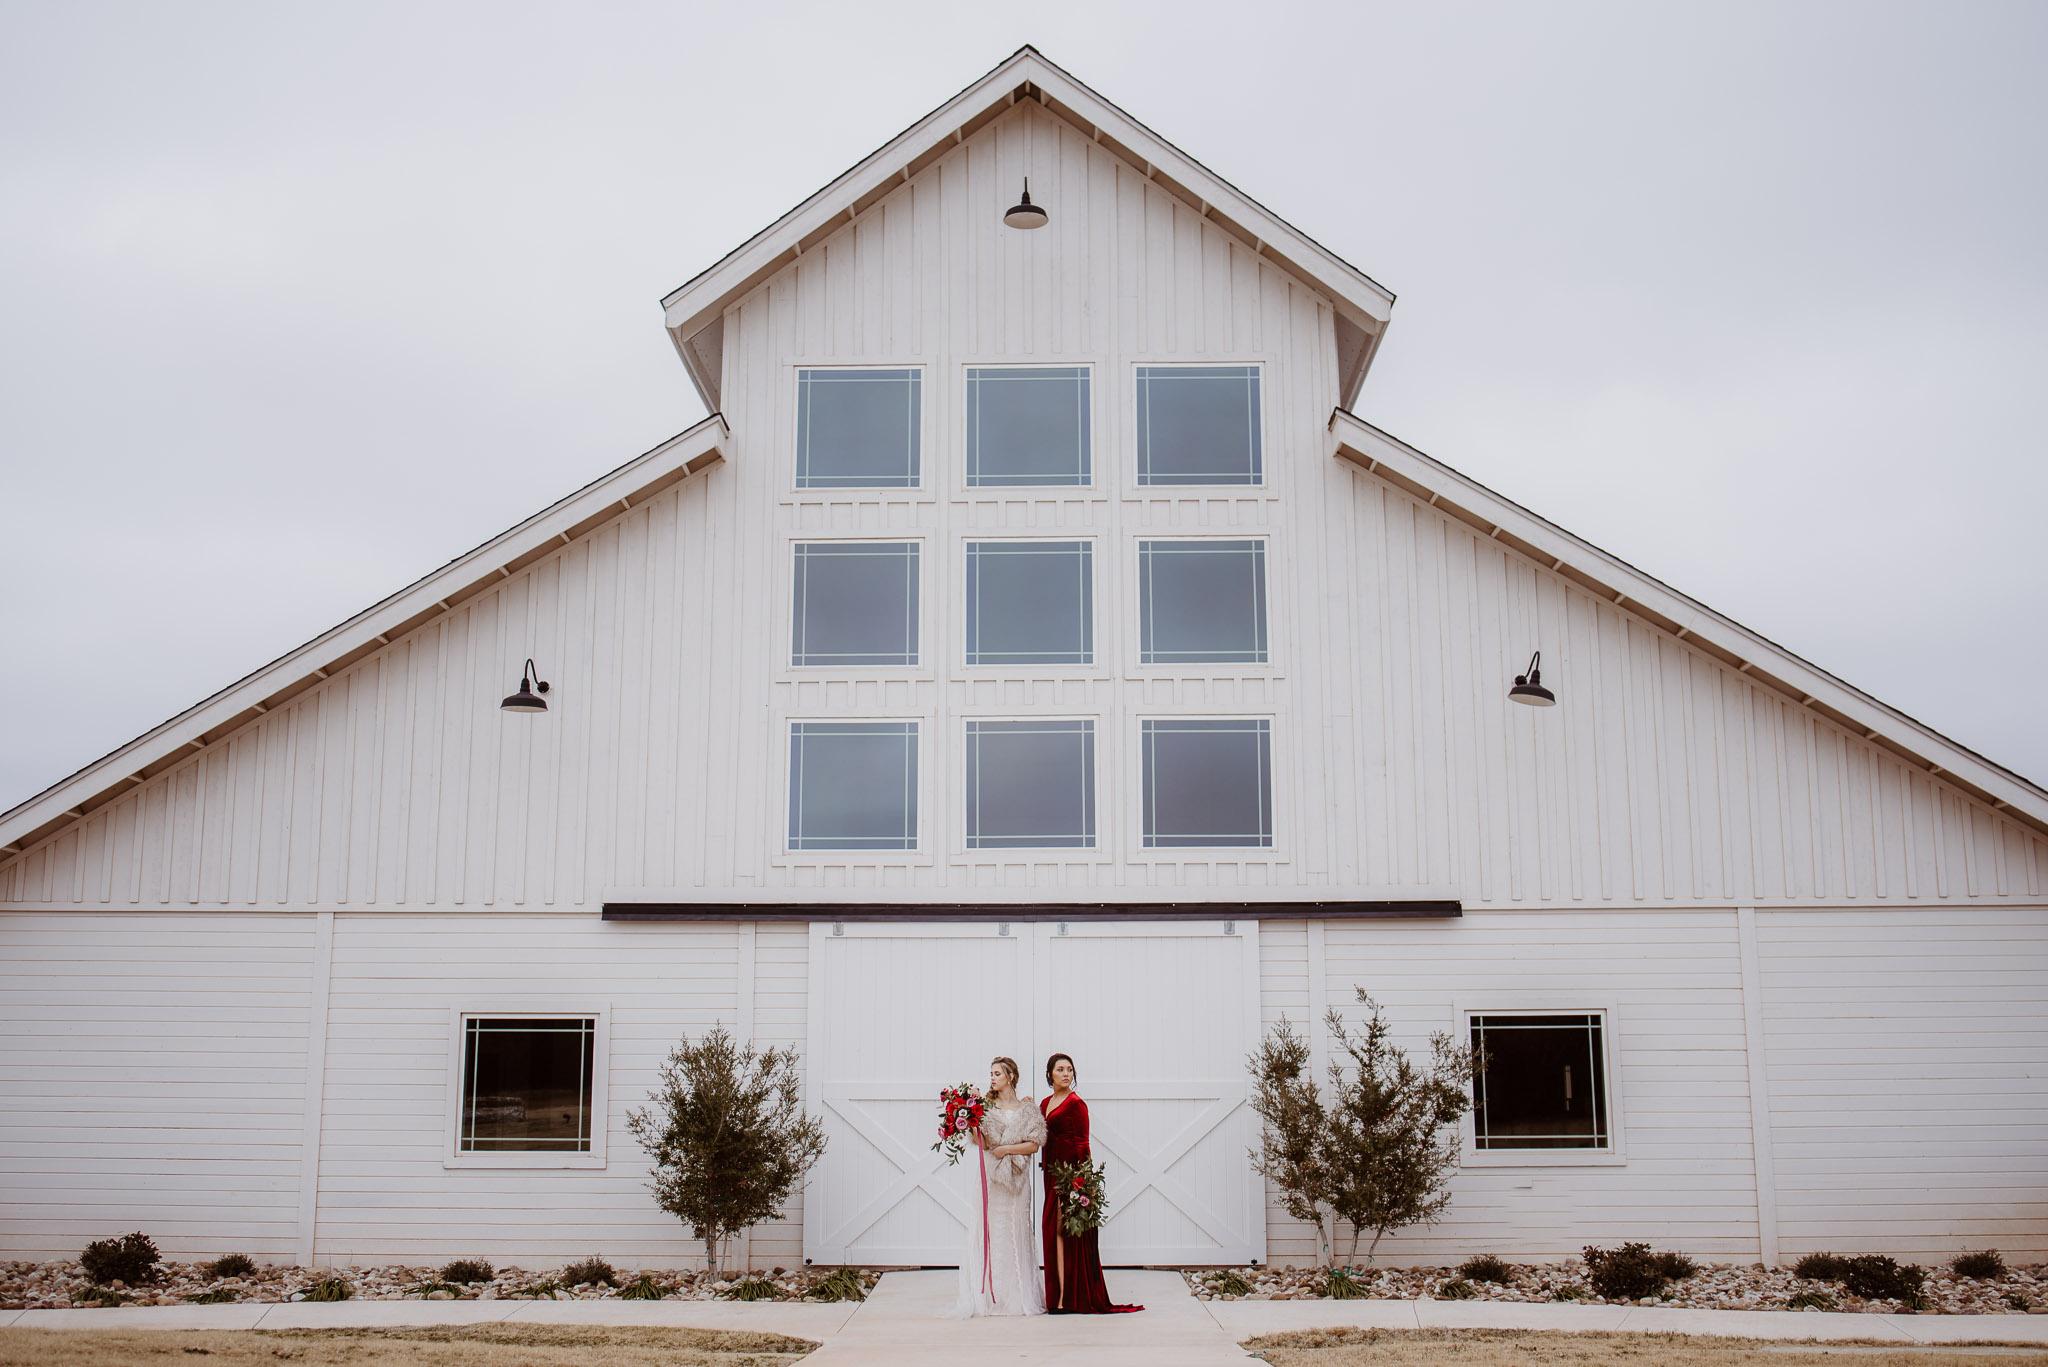 sabrina-cedars-abilene-texas-wedding-venue-0011.jpg